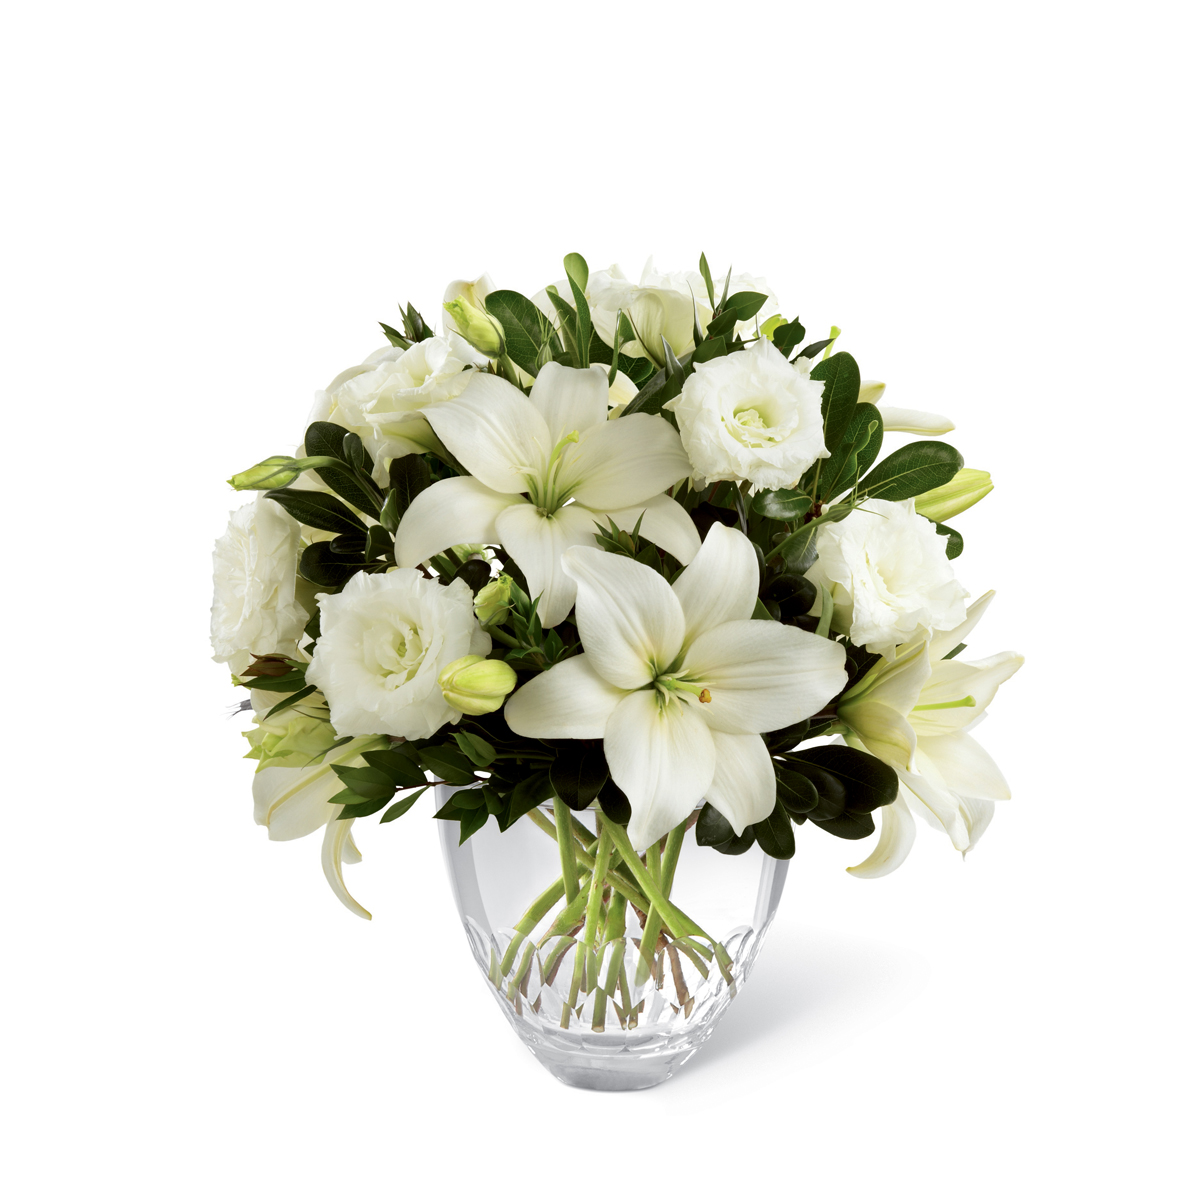 The Ftd White Elegance Bouquet Gulfport Ms Florist